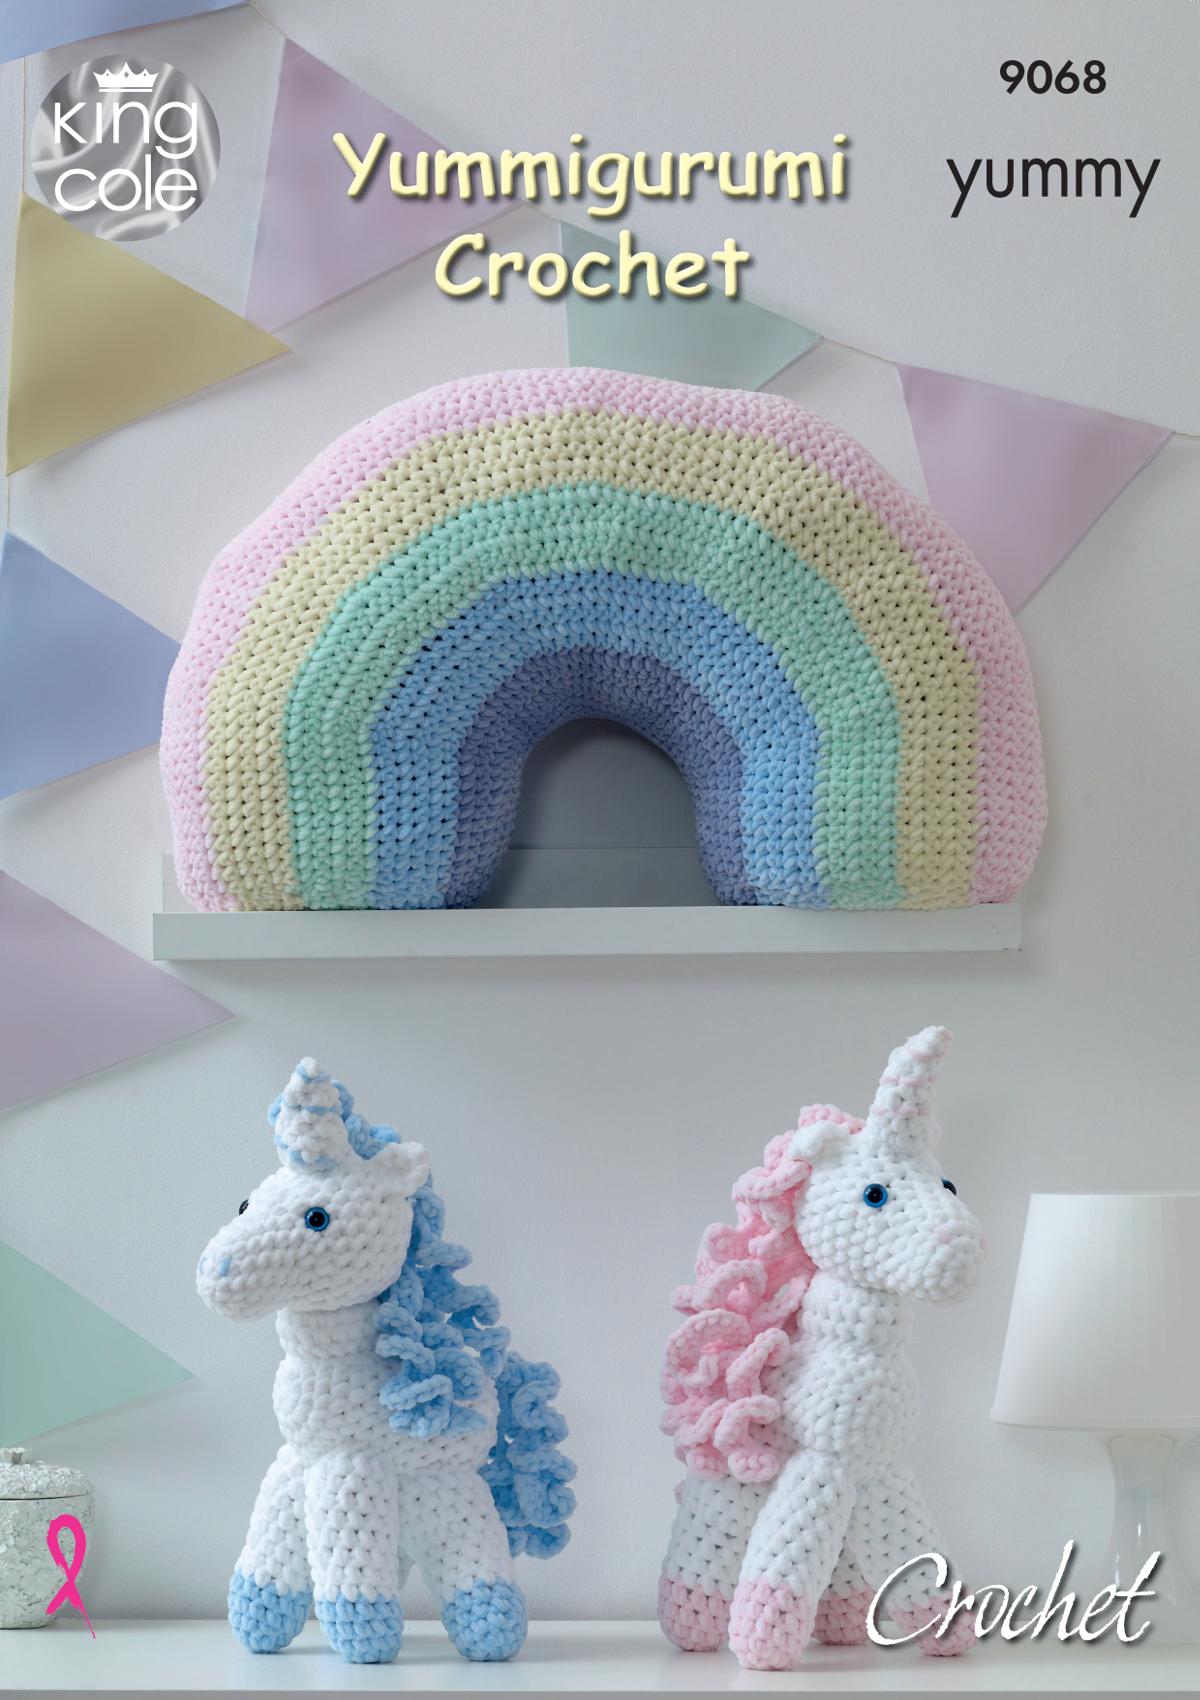 Queen's Guard Bear. UK London. Crochet. Amigurumi. Toy. Stuffed ... | 1700x1200